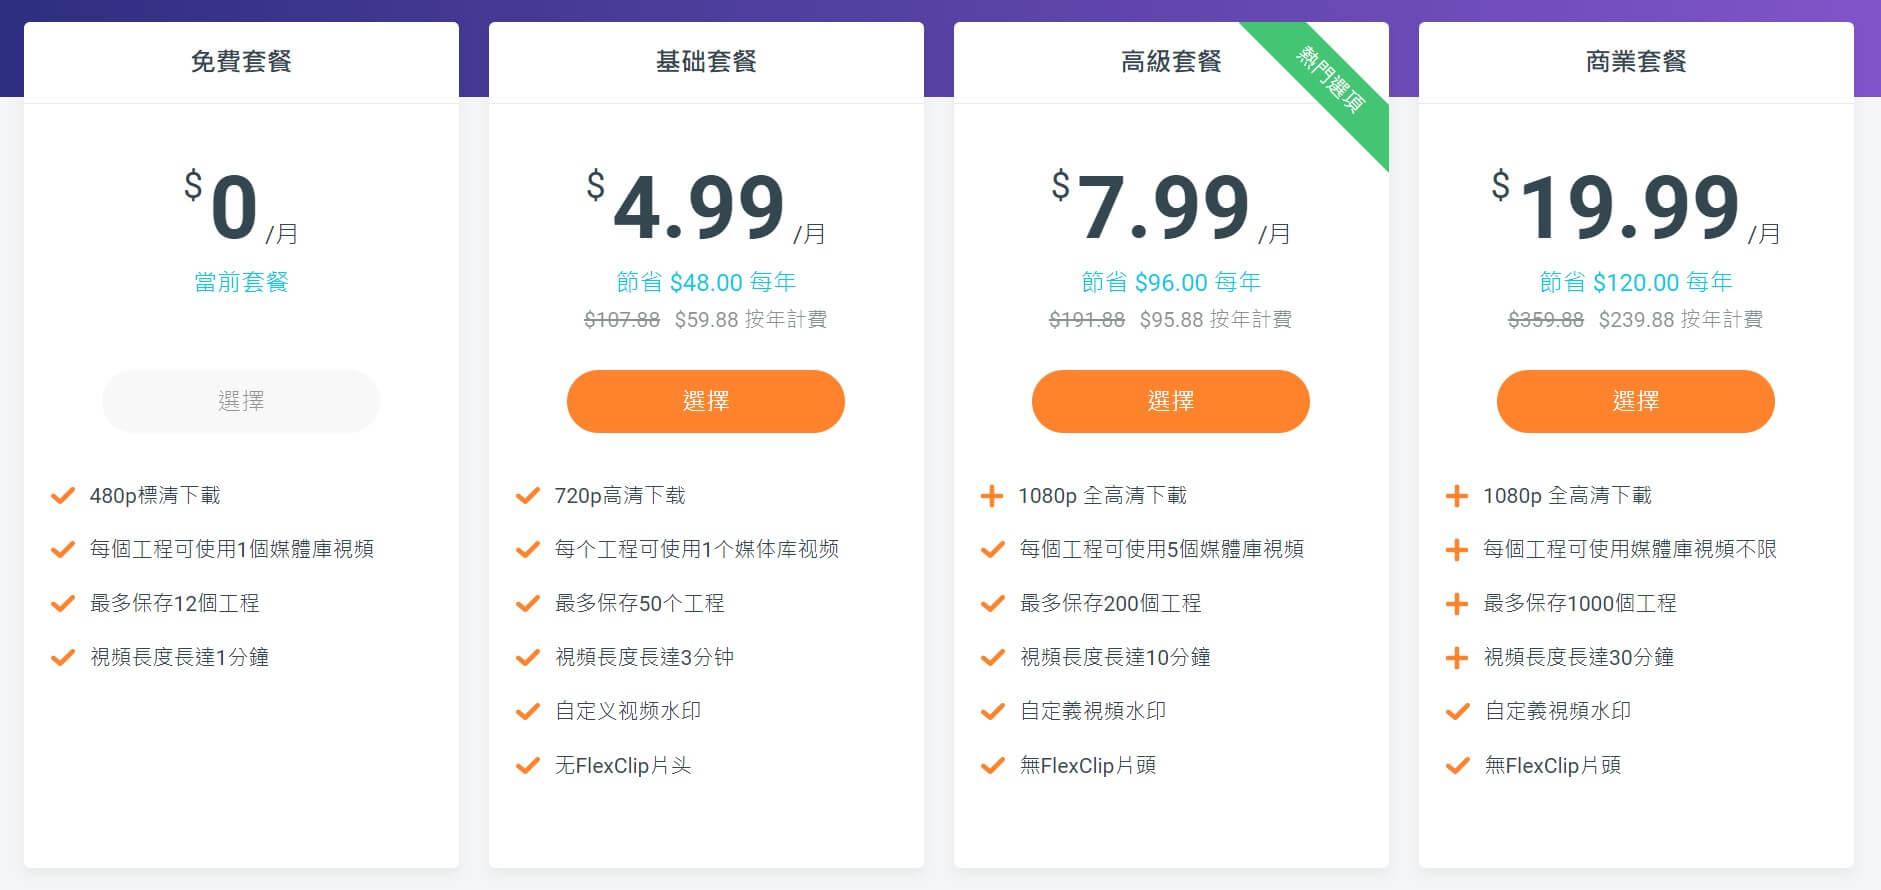 FlexClip 的付費方案